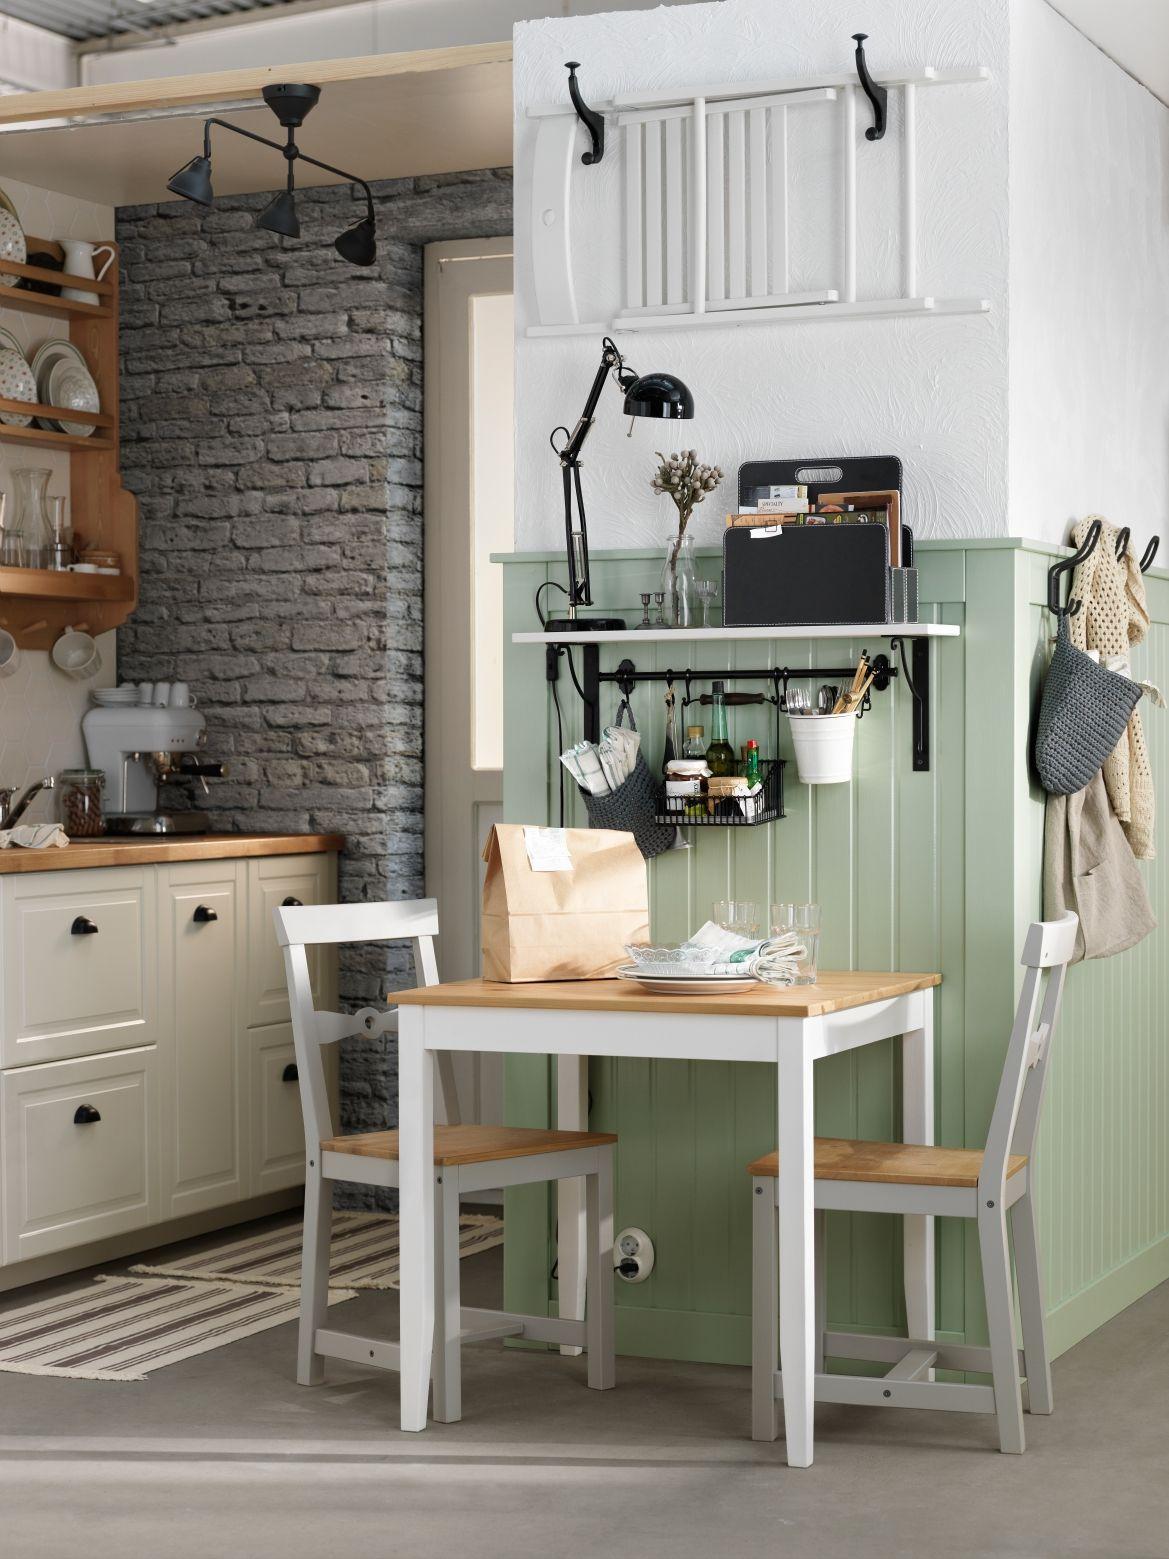 Ikea Barre Cuisine | Pin By Pufulete Jenica On Bucatarii Pinterest Ikea Kitchen And